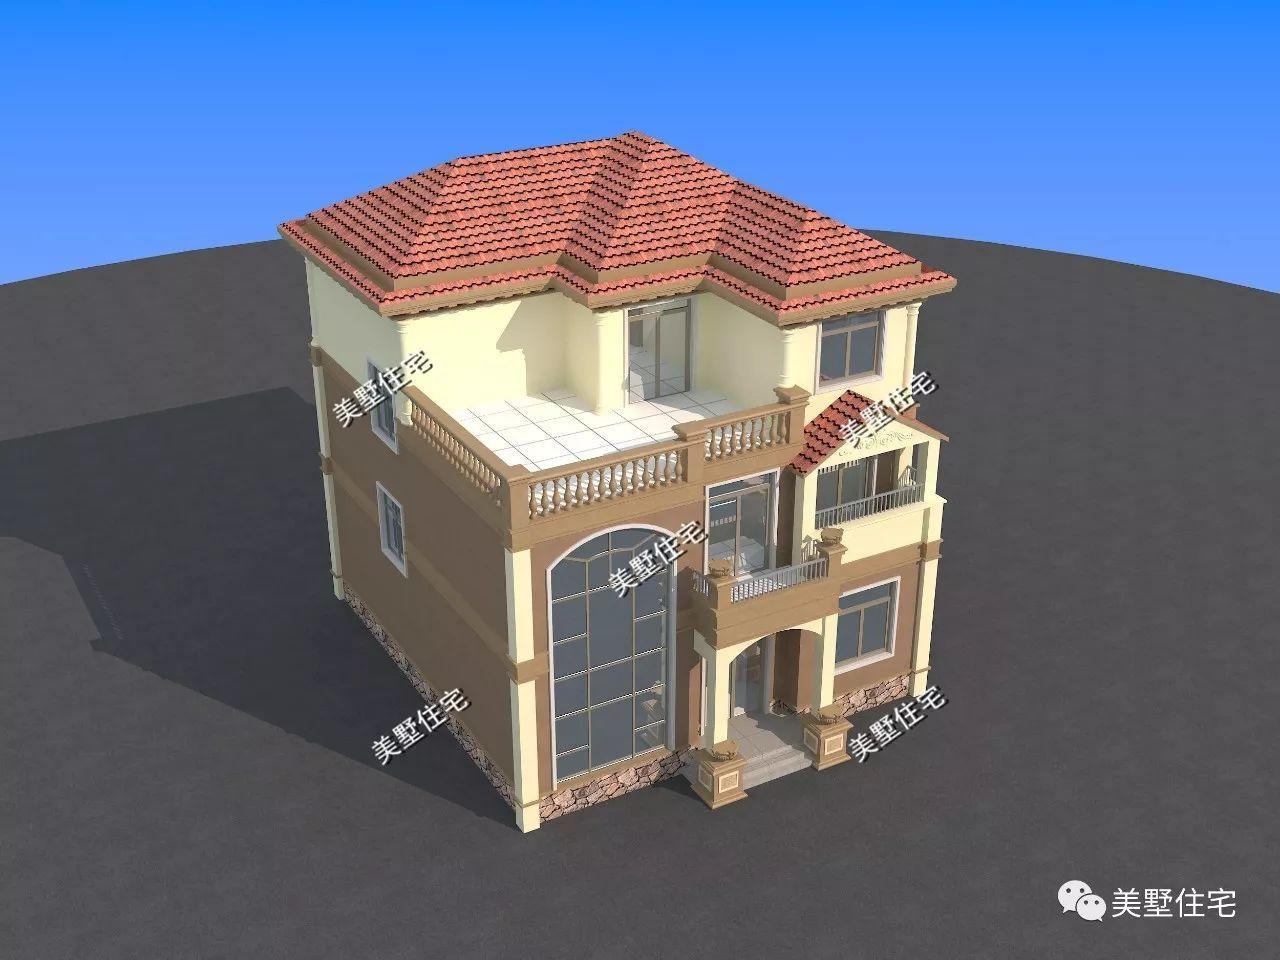 11x13米带露台飘窗三层农村别墅,造型高大上,符合现代农村